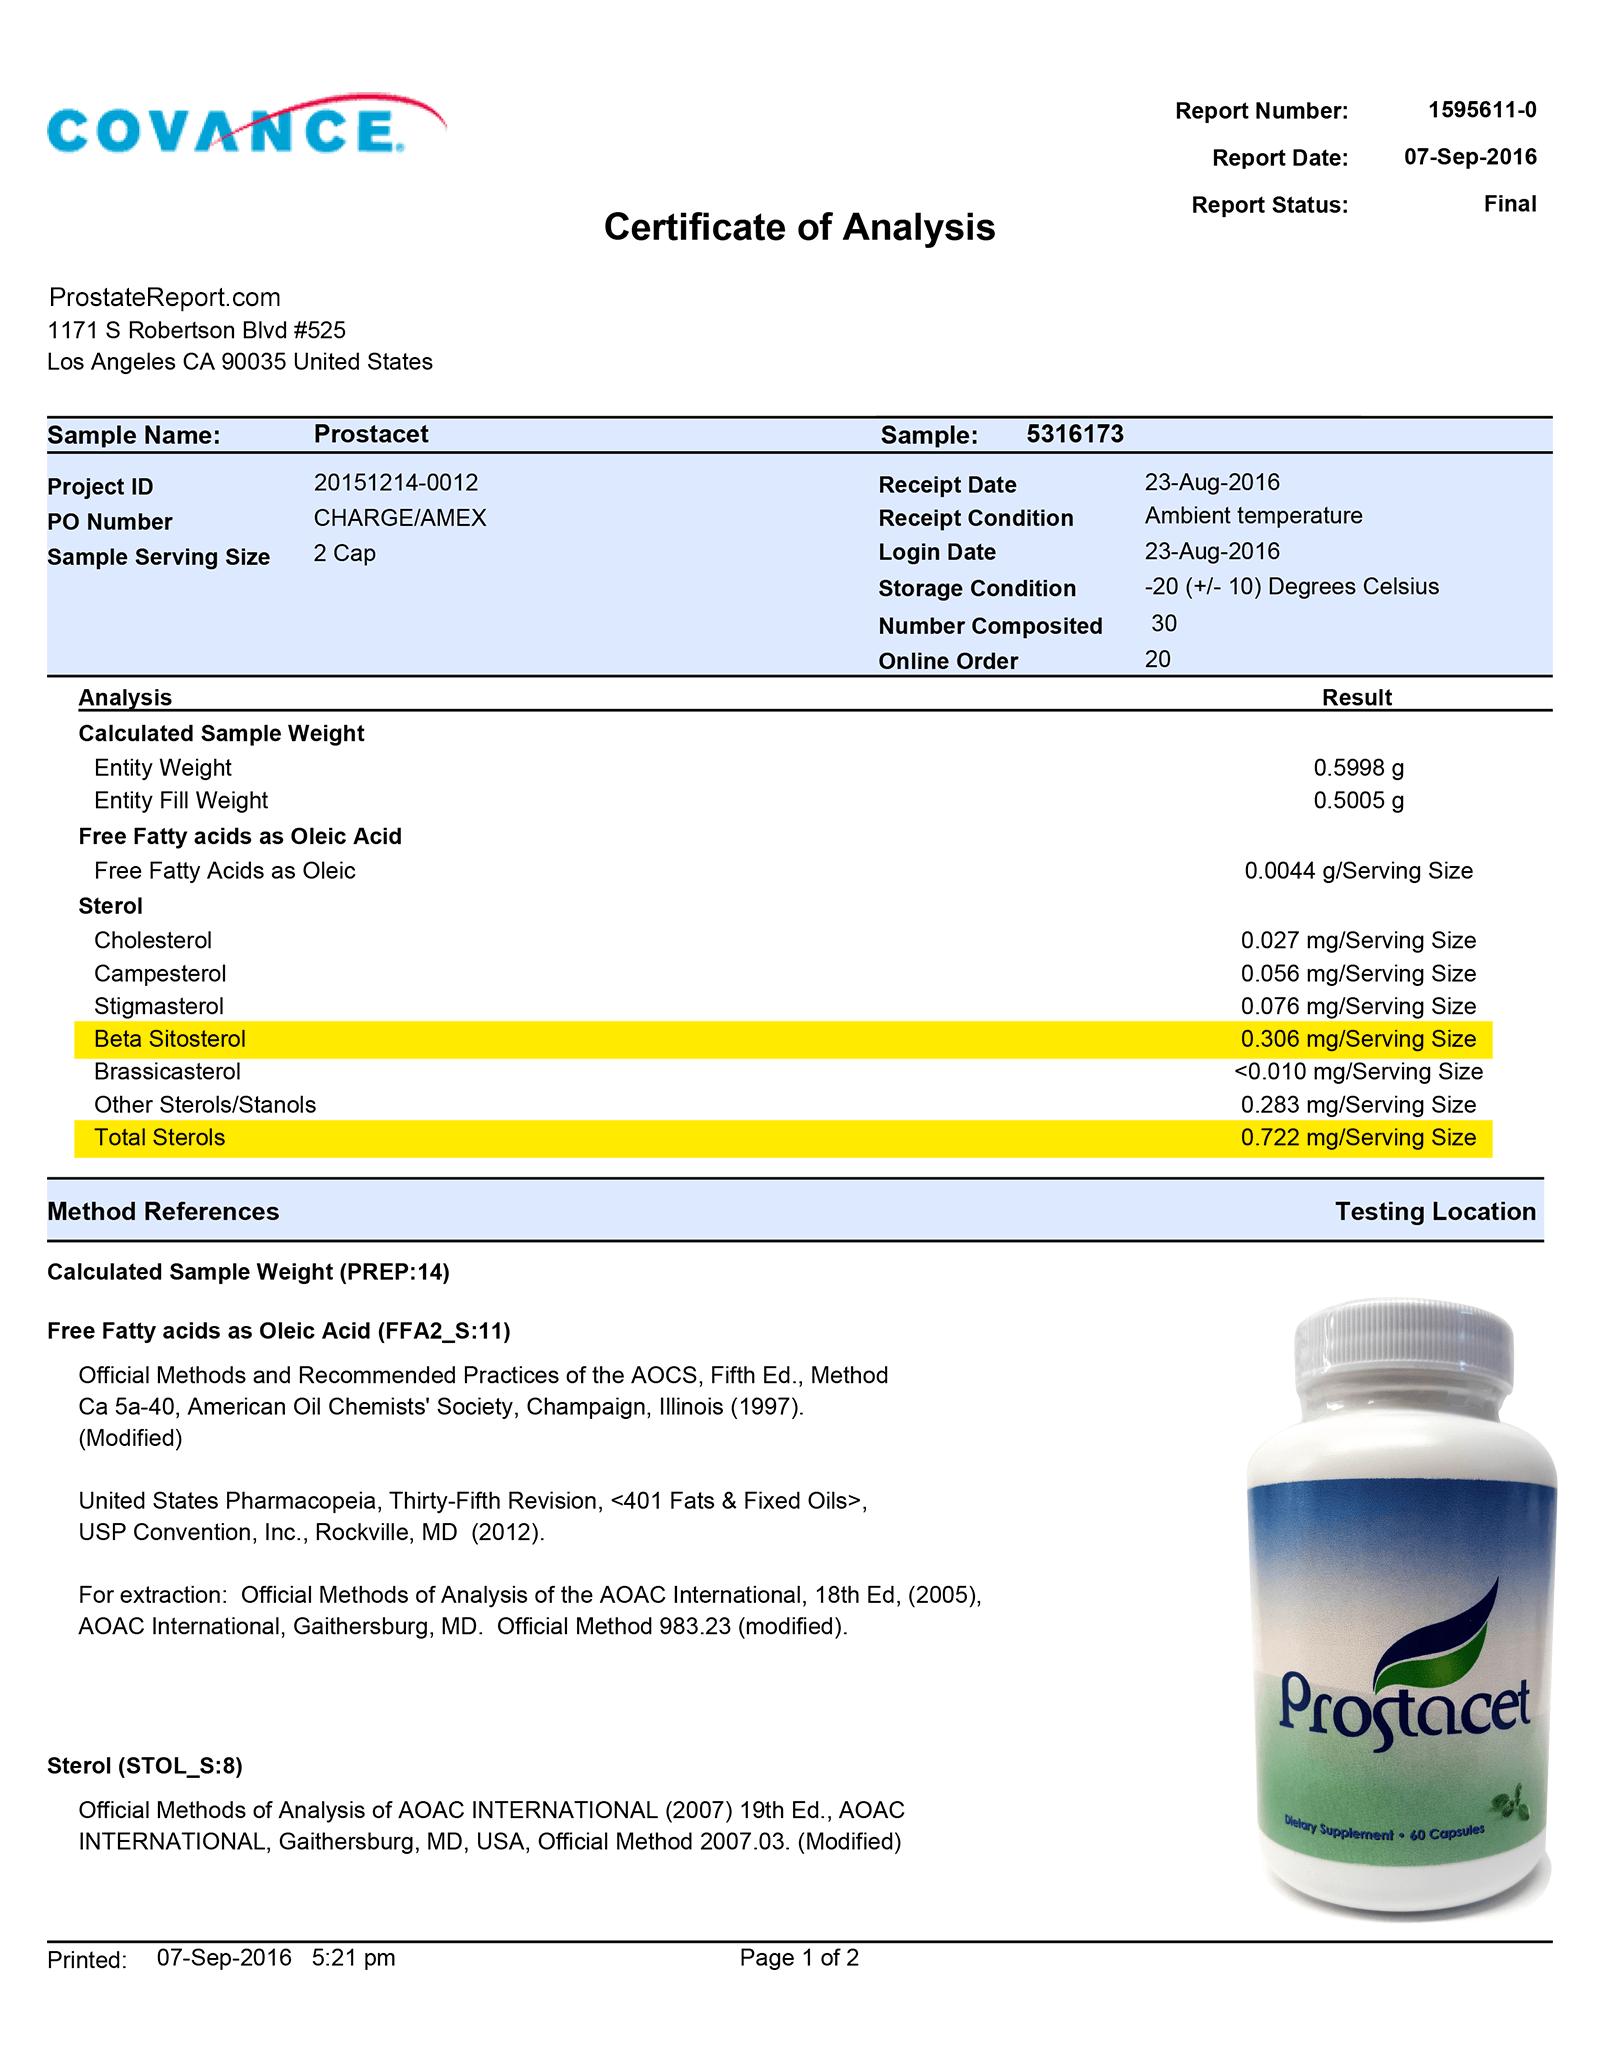 Prostacet lab report